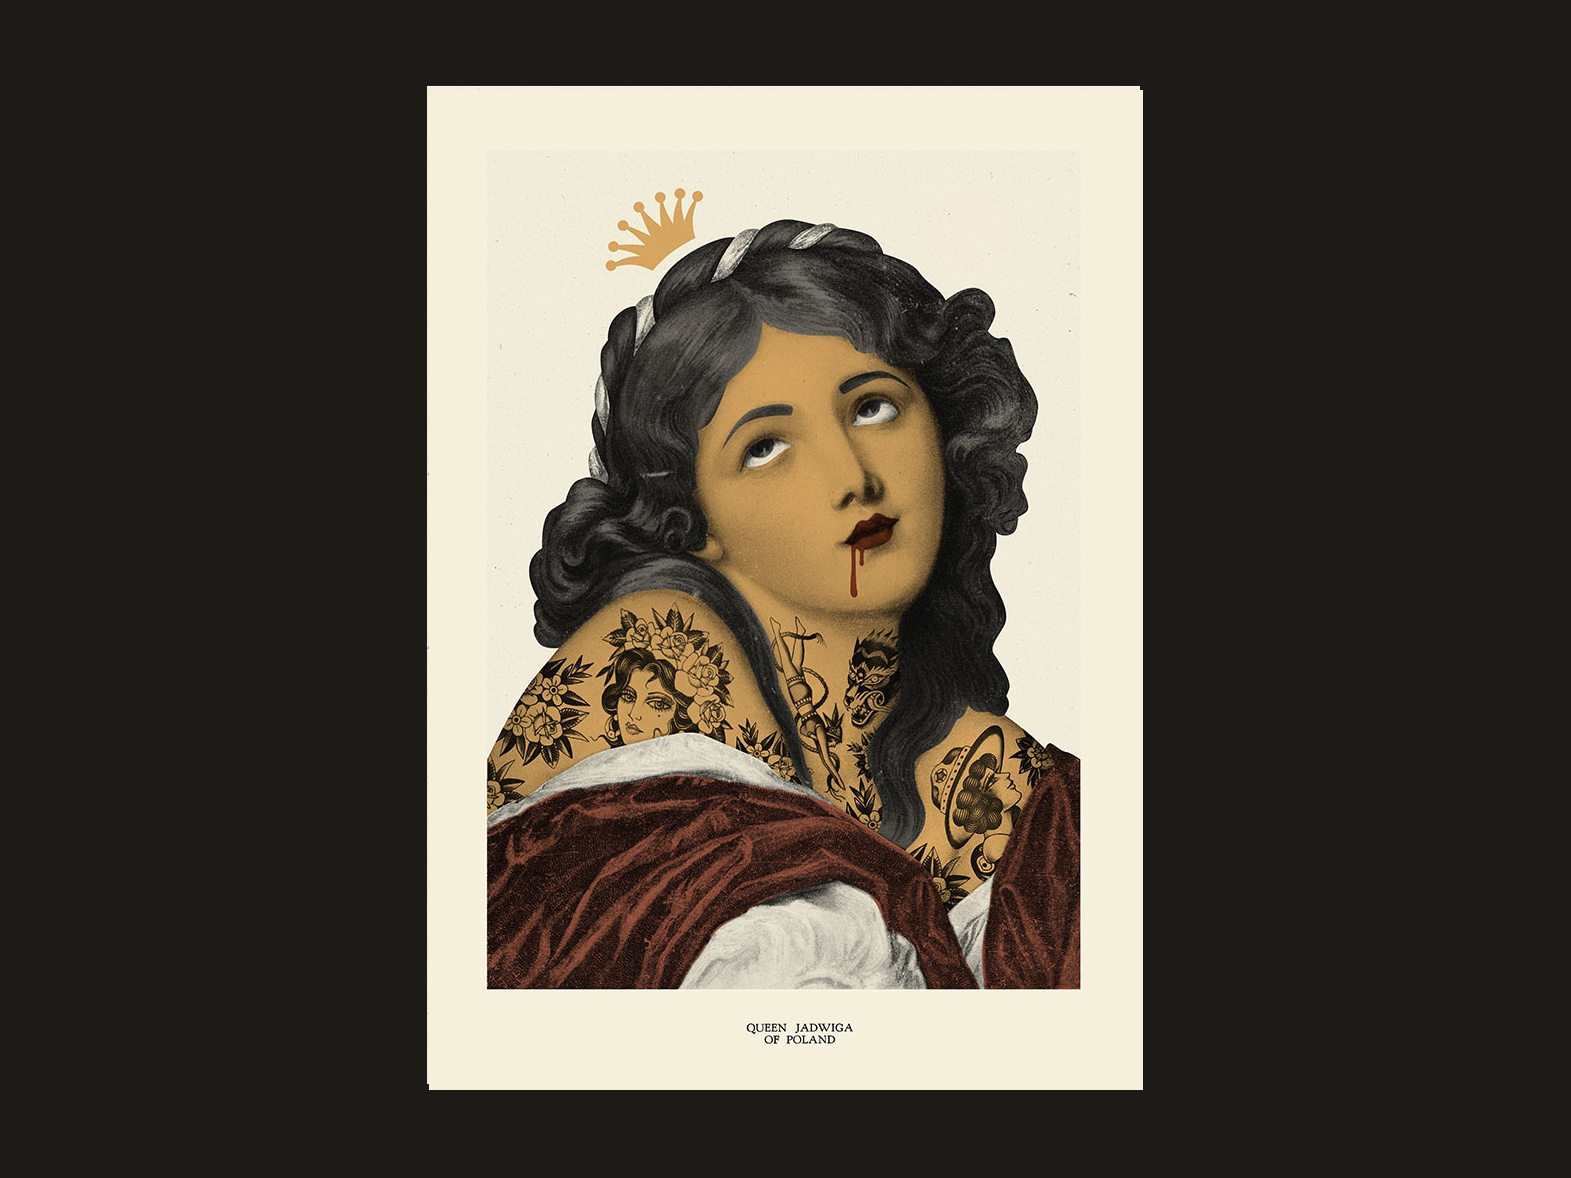 jadwiga queen of poland | poster illustration art queen tattoo art tattoo woman women girls girl actor cutout illustration gigposter collage collage art